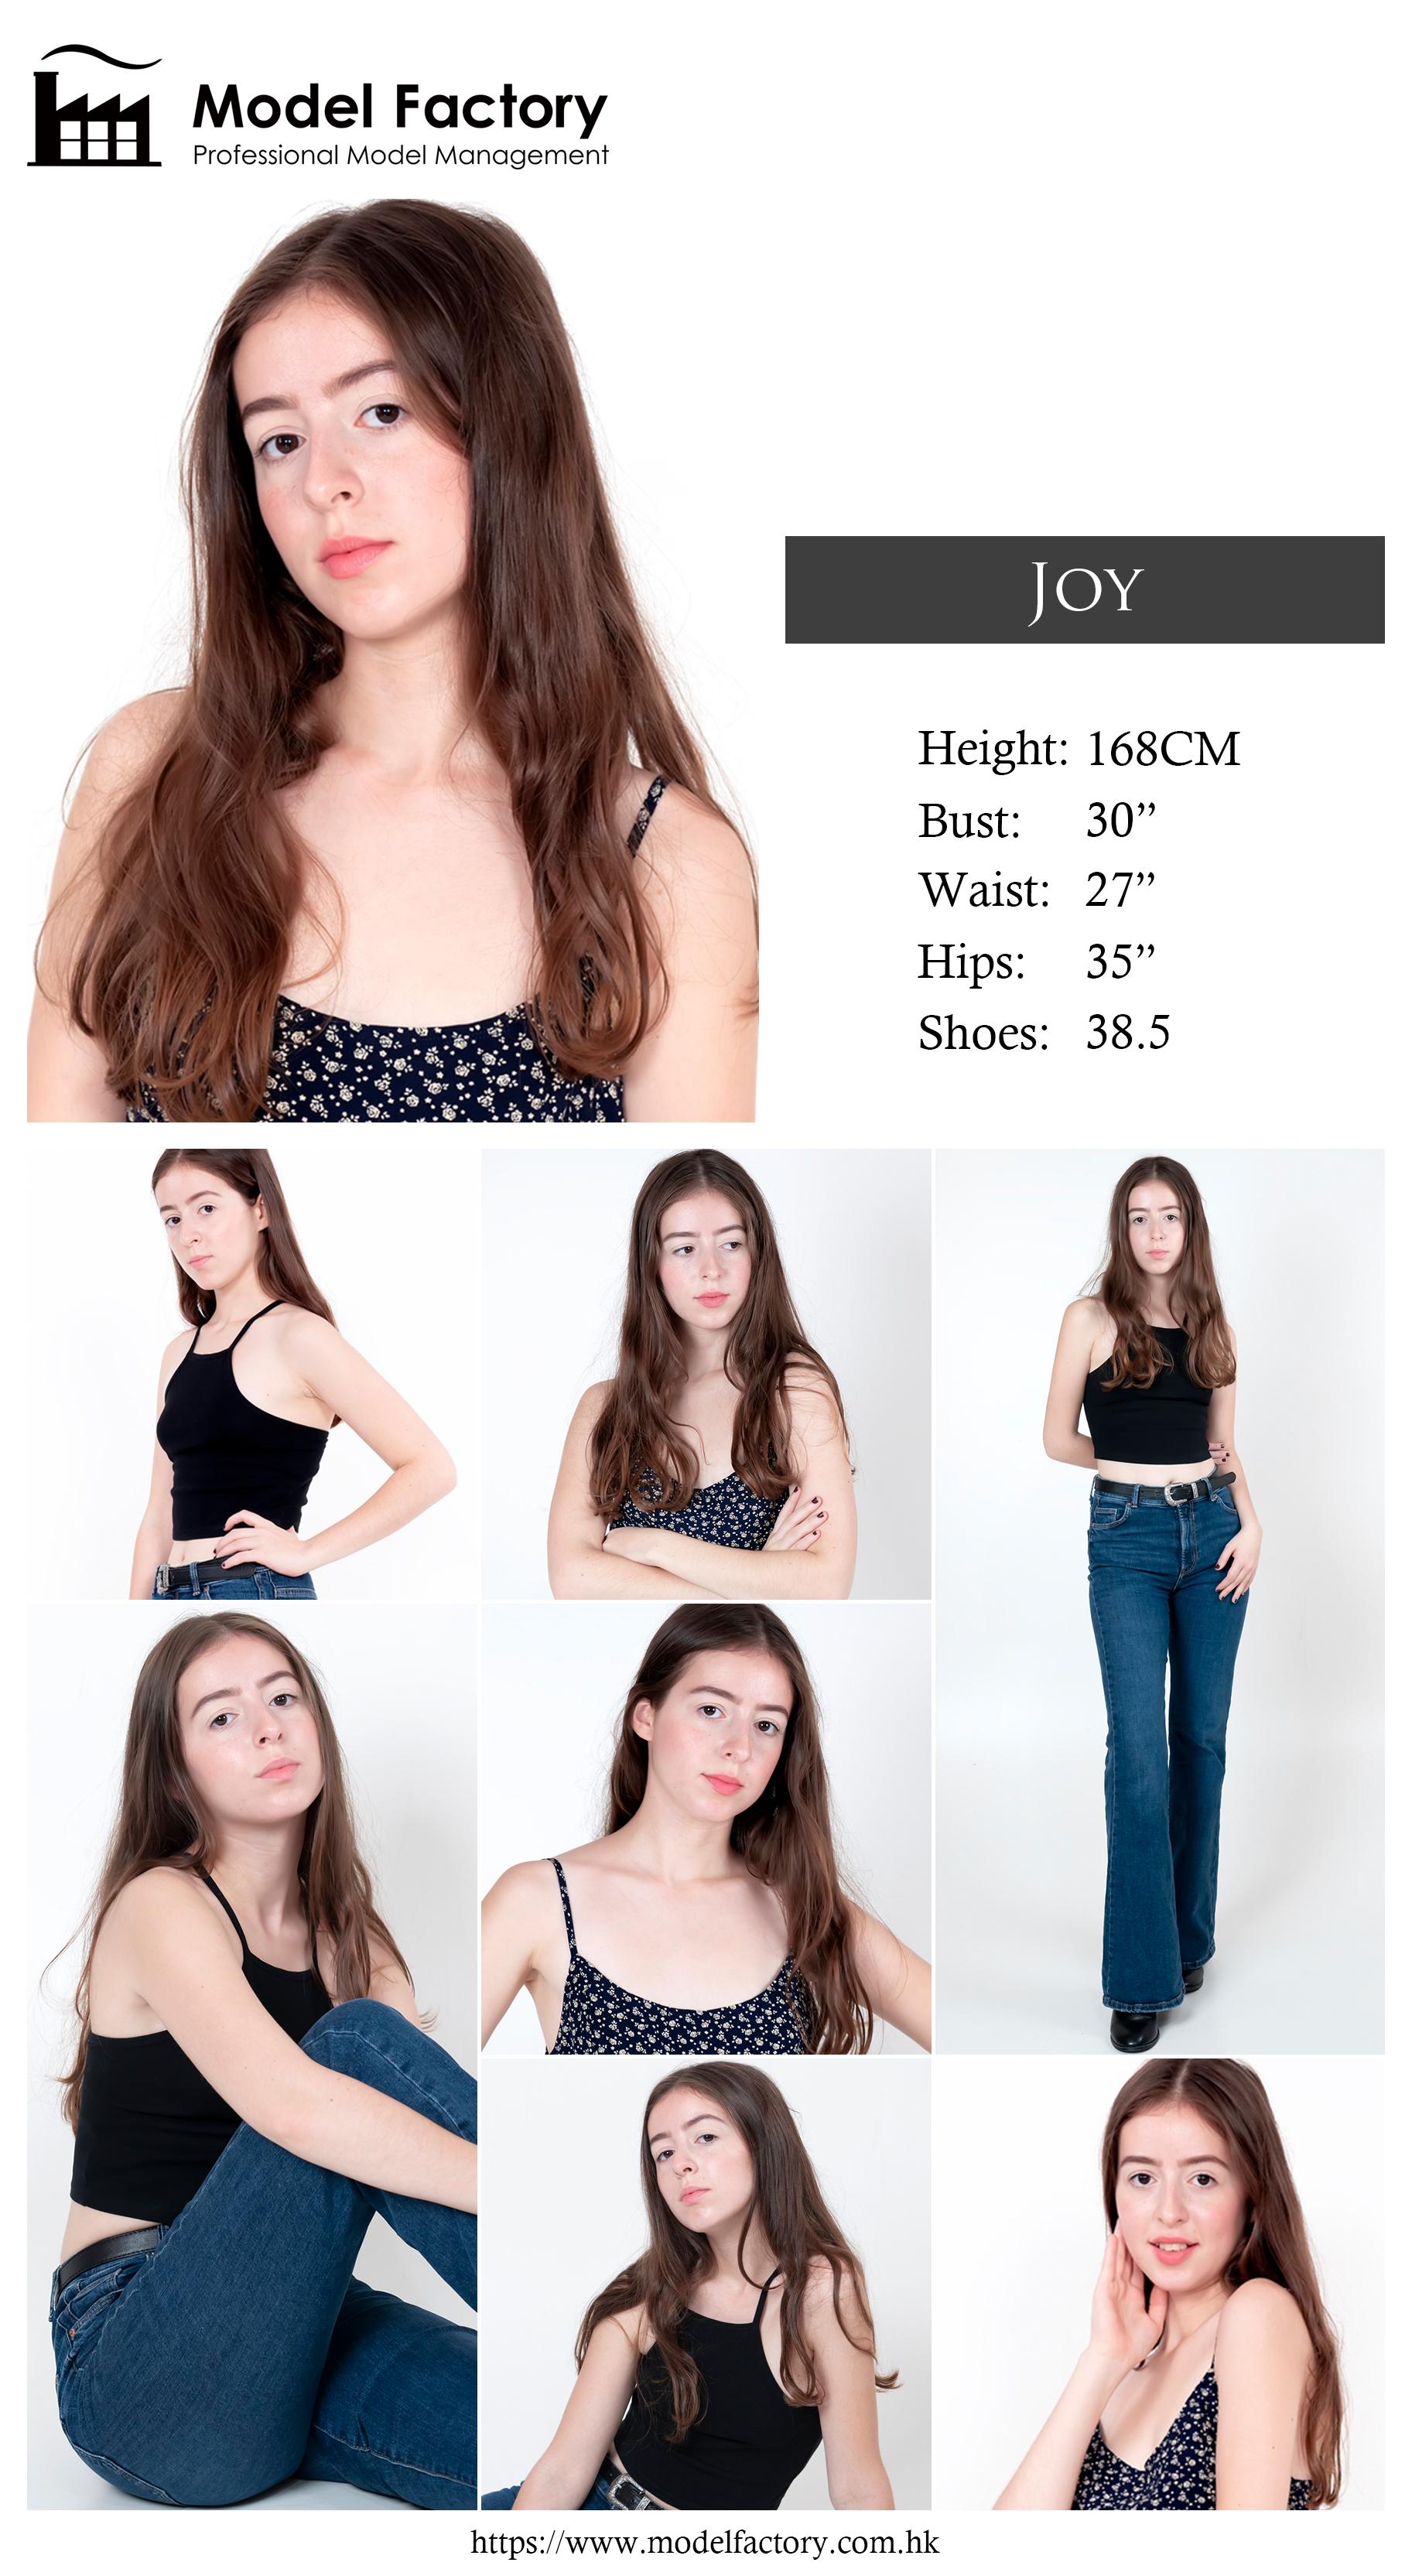 Model Factory Caucasian Female Model Joy